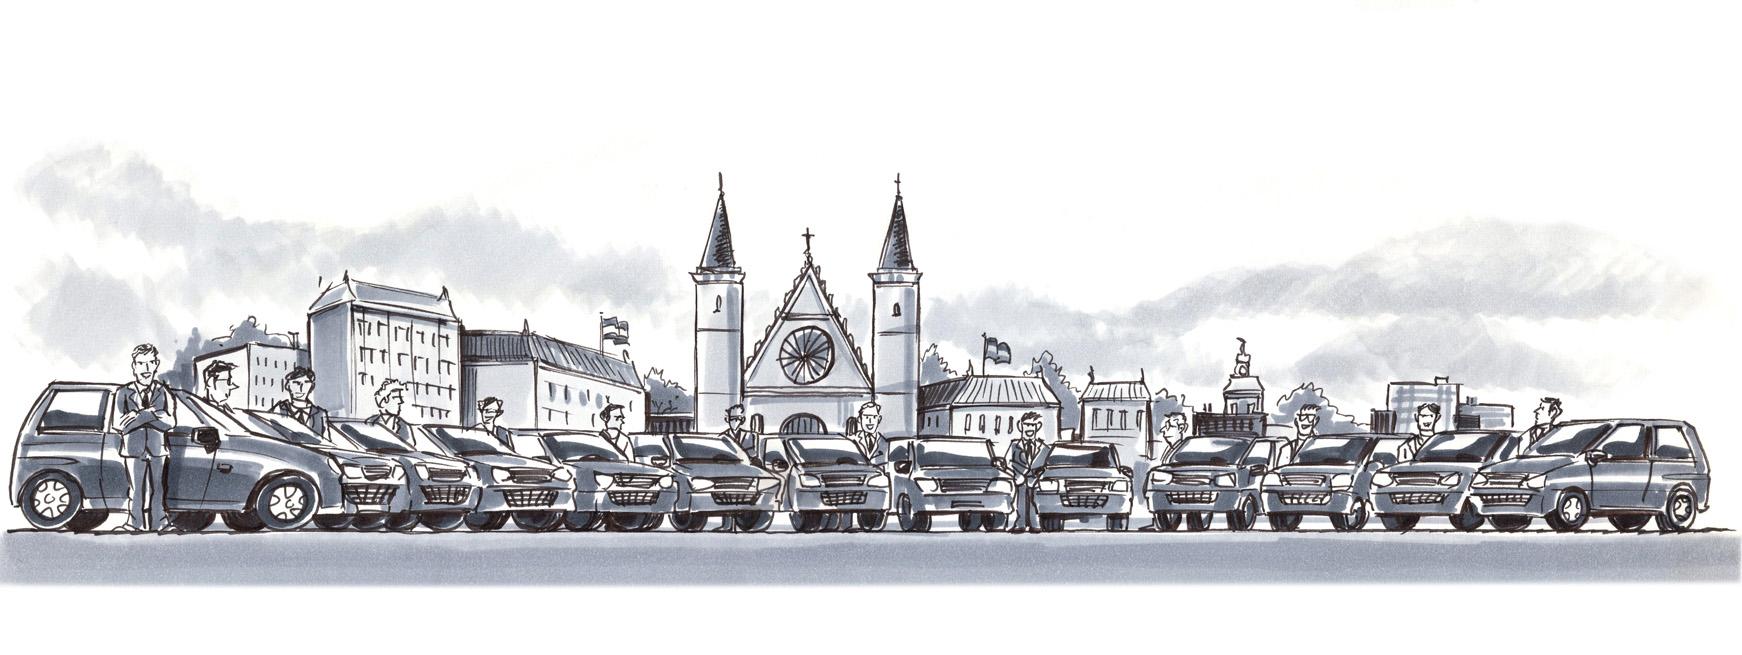 Binnenhof_autos_web